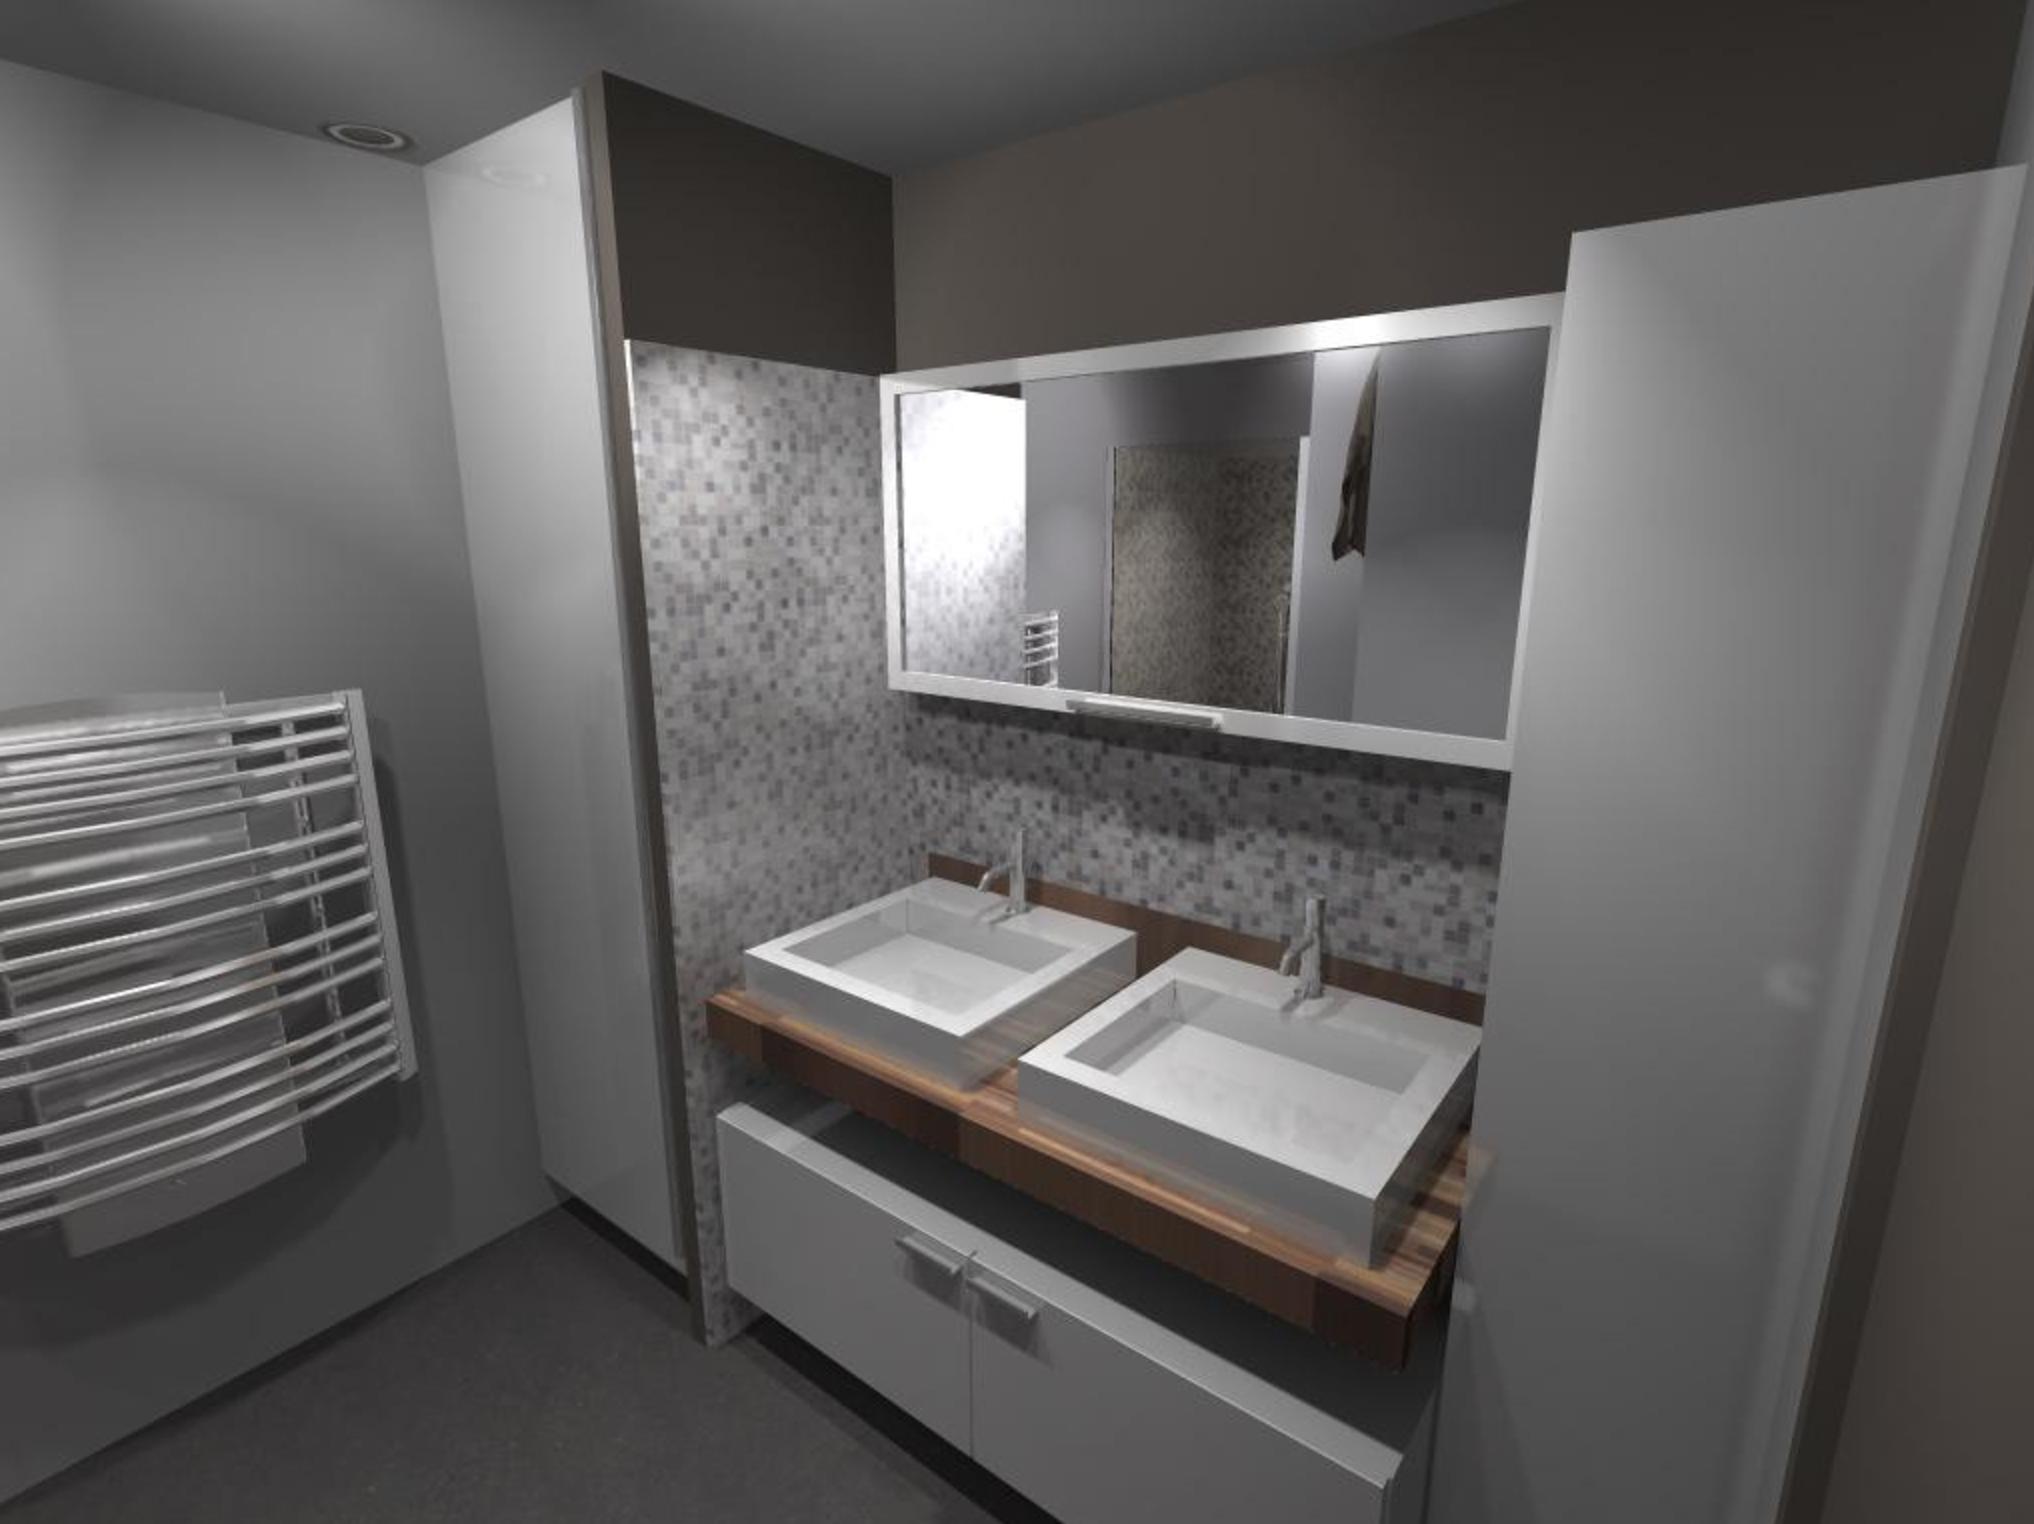 Salle De Bain Chambery ~ salle de bain aix les bains annecy chambery geneve savoie rumilly